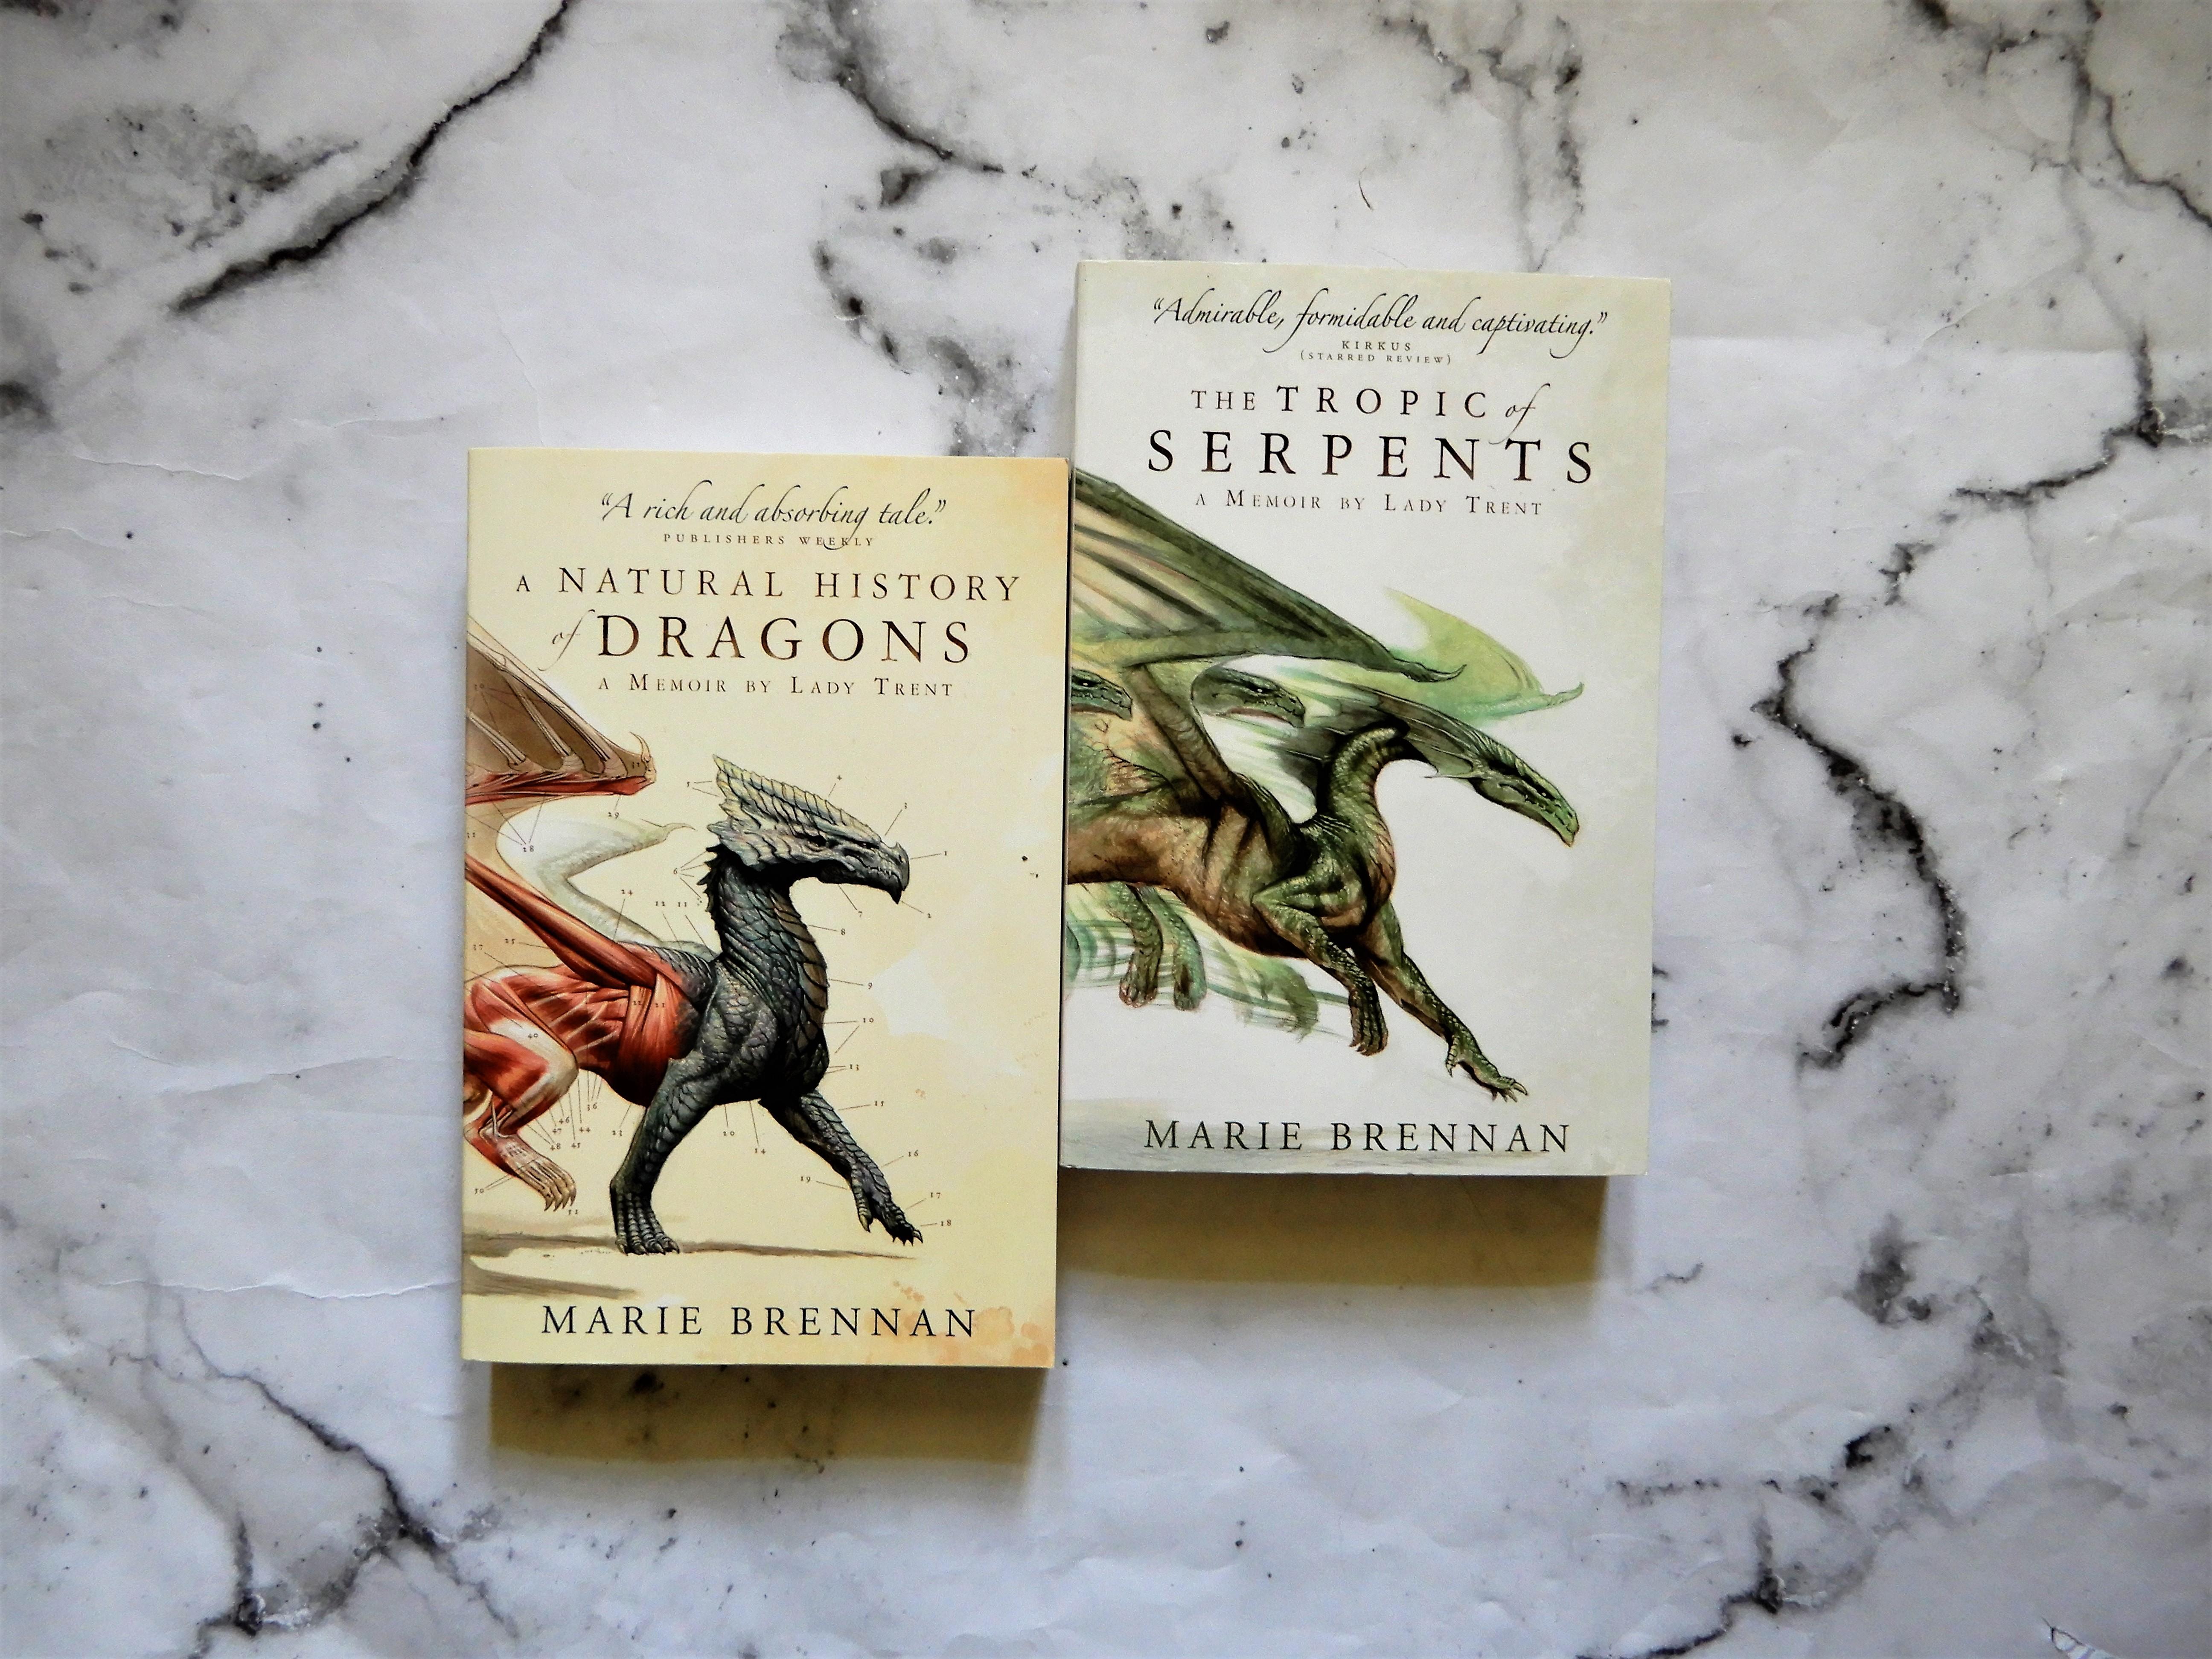 A Natural History of Dragons / Marie Brennan – thelittlebookowl